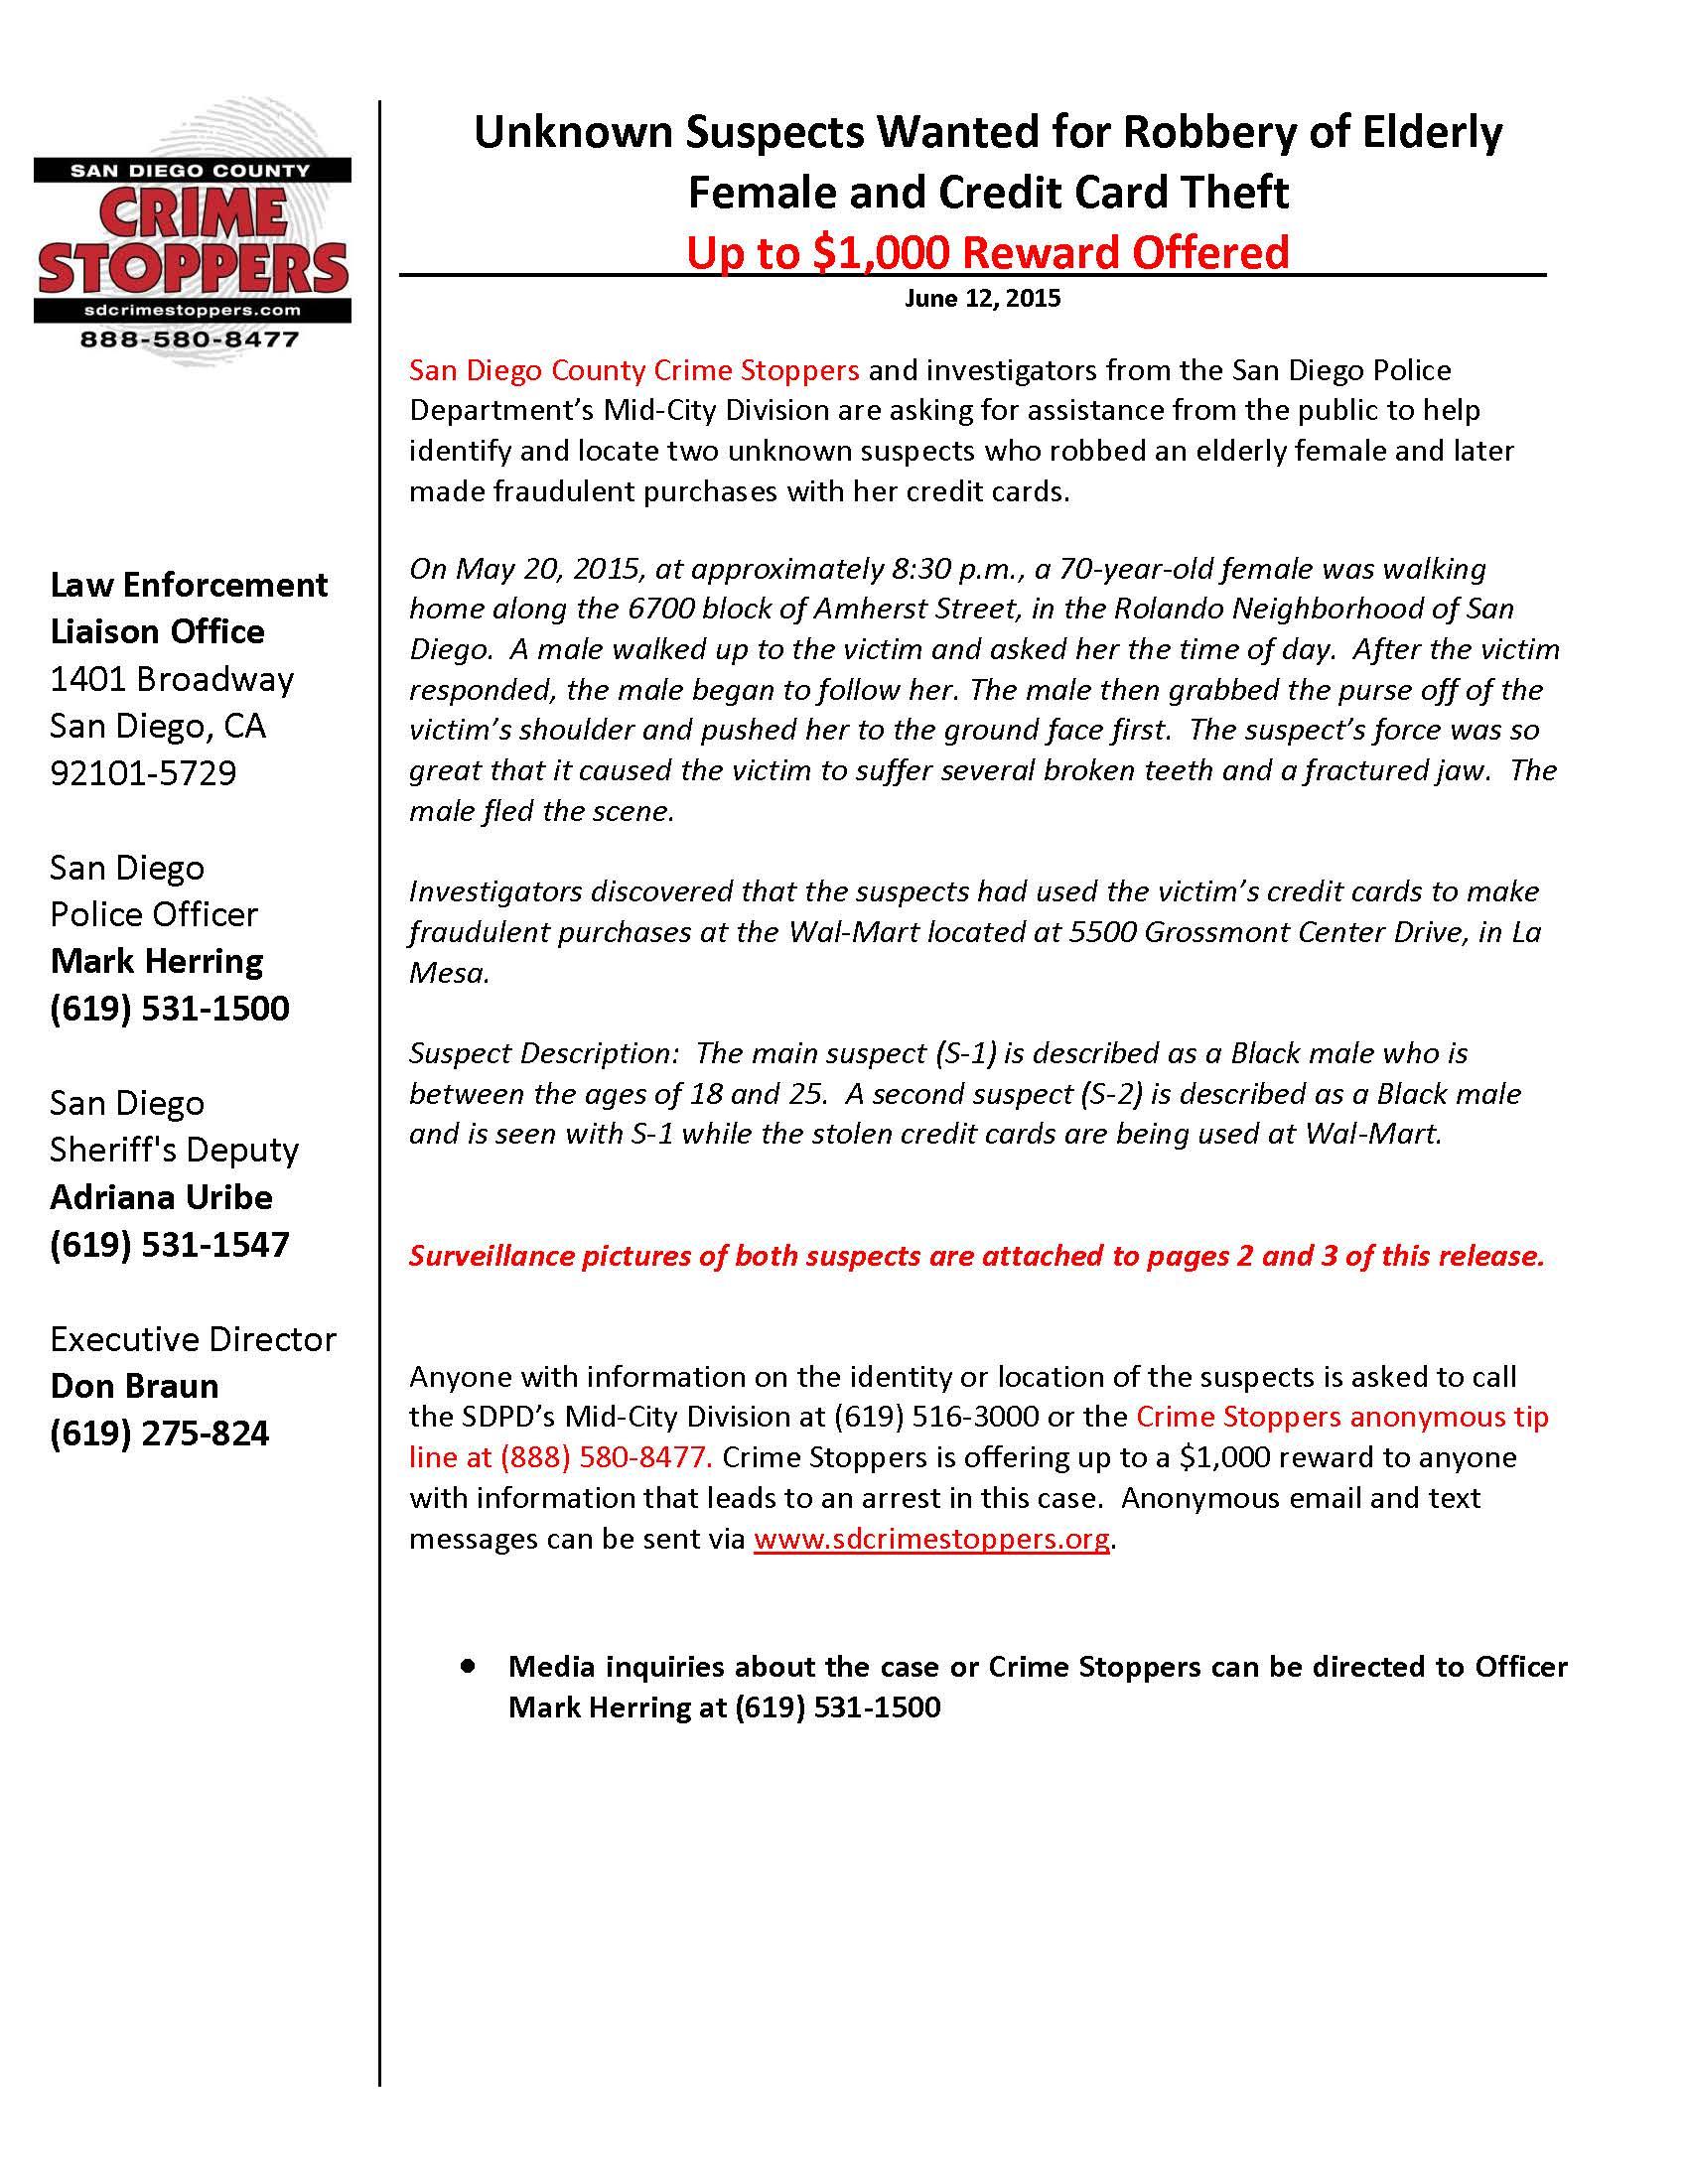 061215 Rolando Area Robbery_Page_1